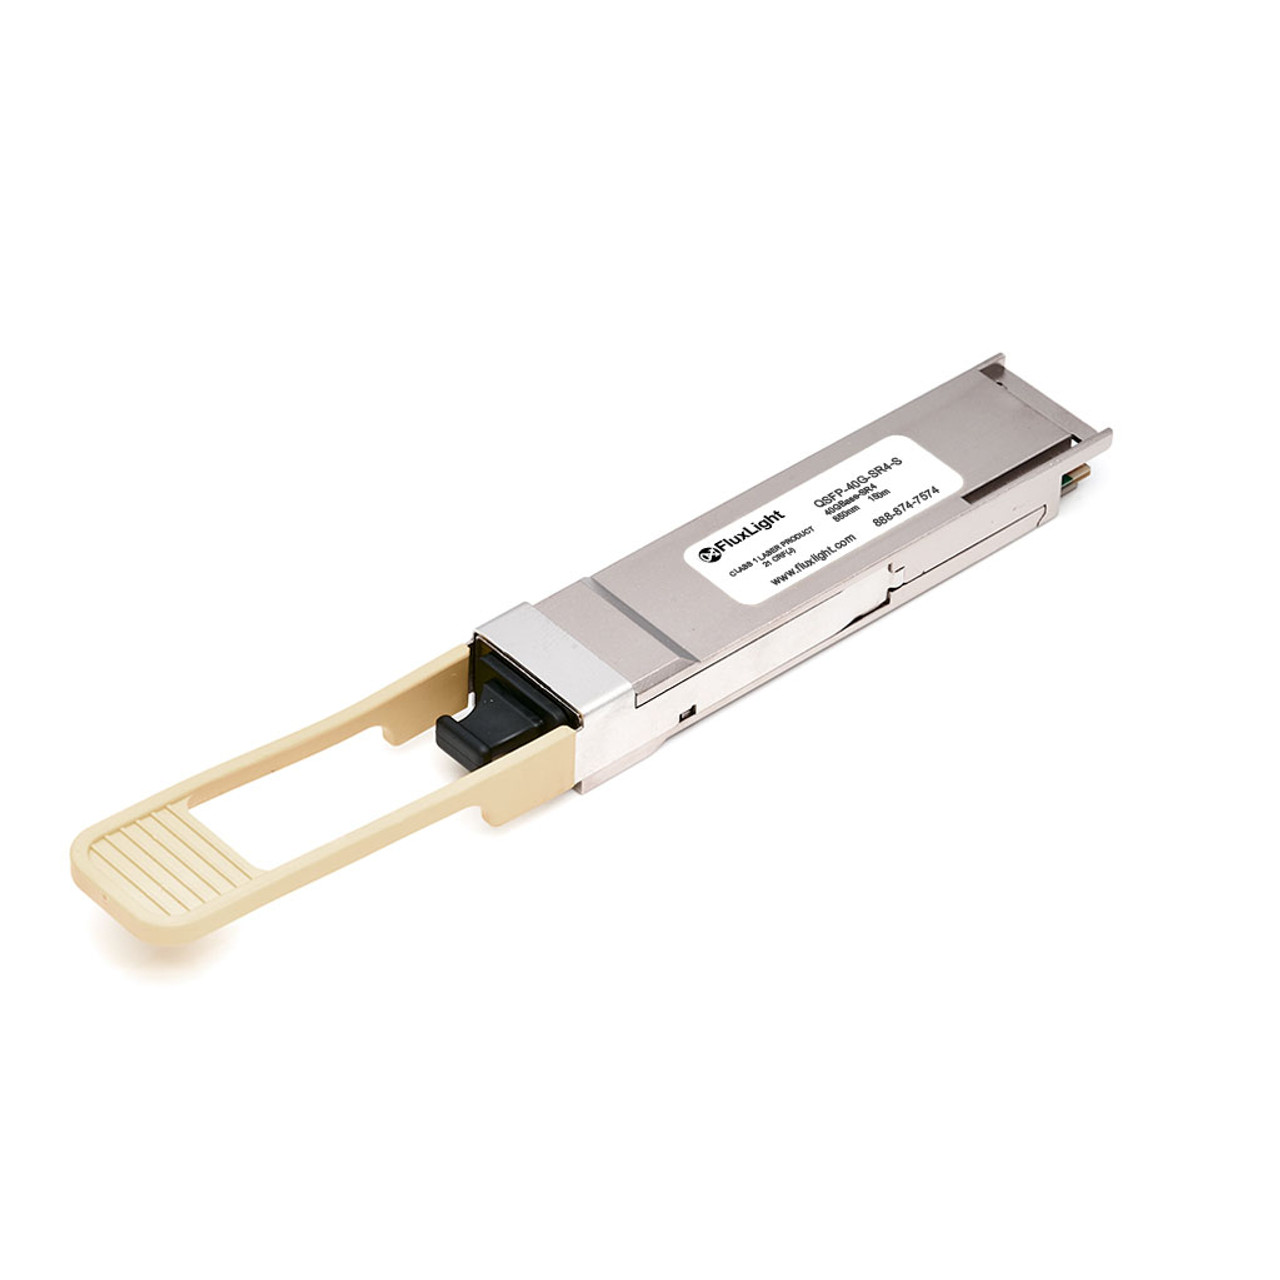 QSFP-40G-SR4-S Cisco Compatible (40GBase-SR4) Optical Transceiver